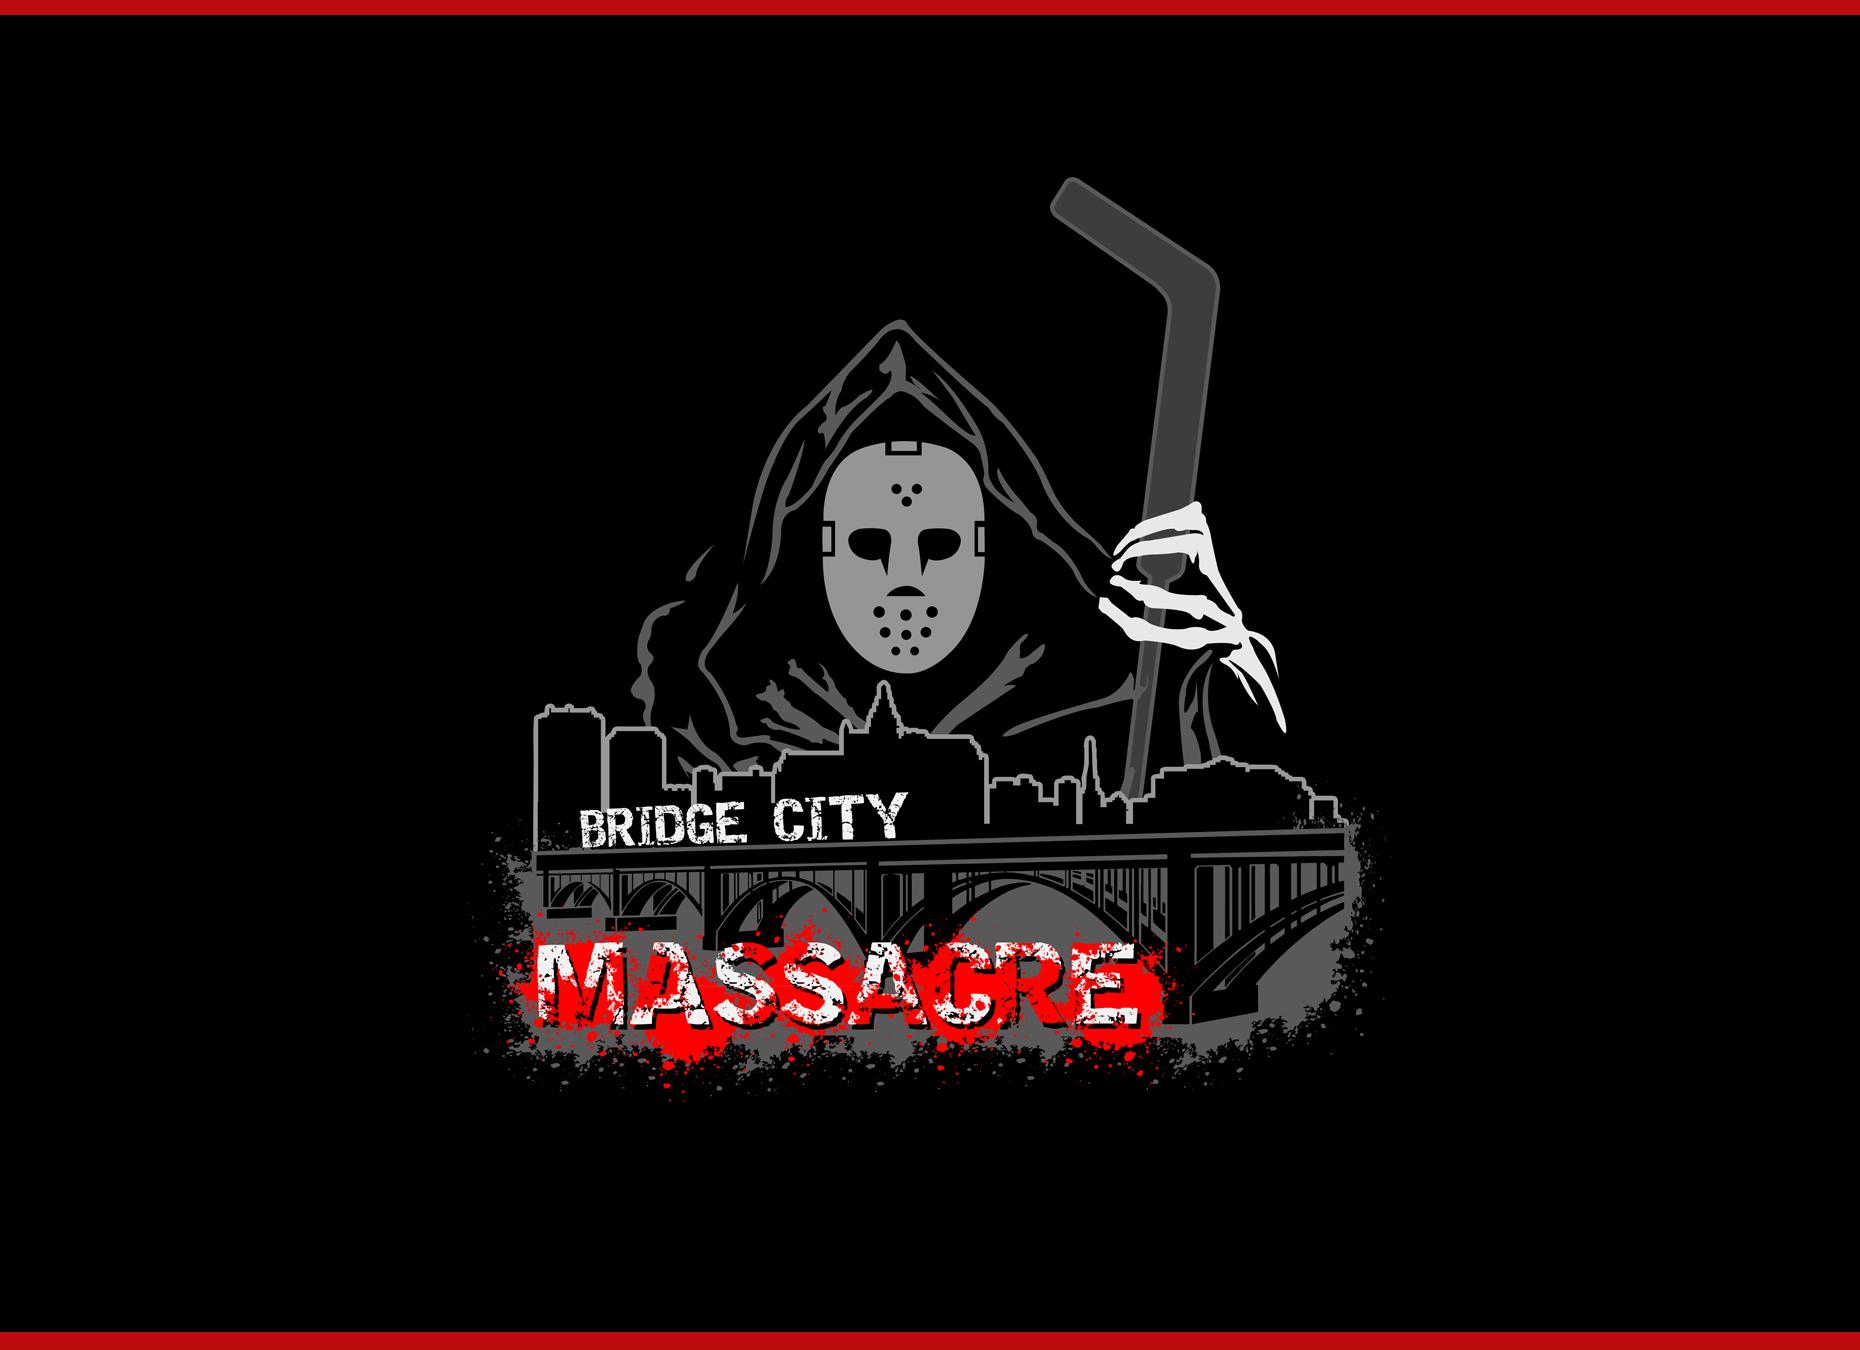 Logo Design by omARTist - Entry No. 37 in the Logo Design Contest New Logo Design for Bridge City Massacre.